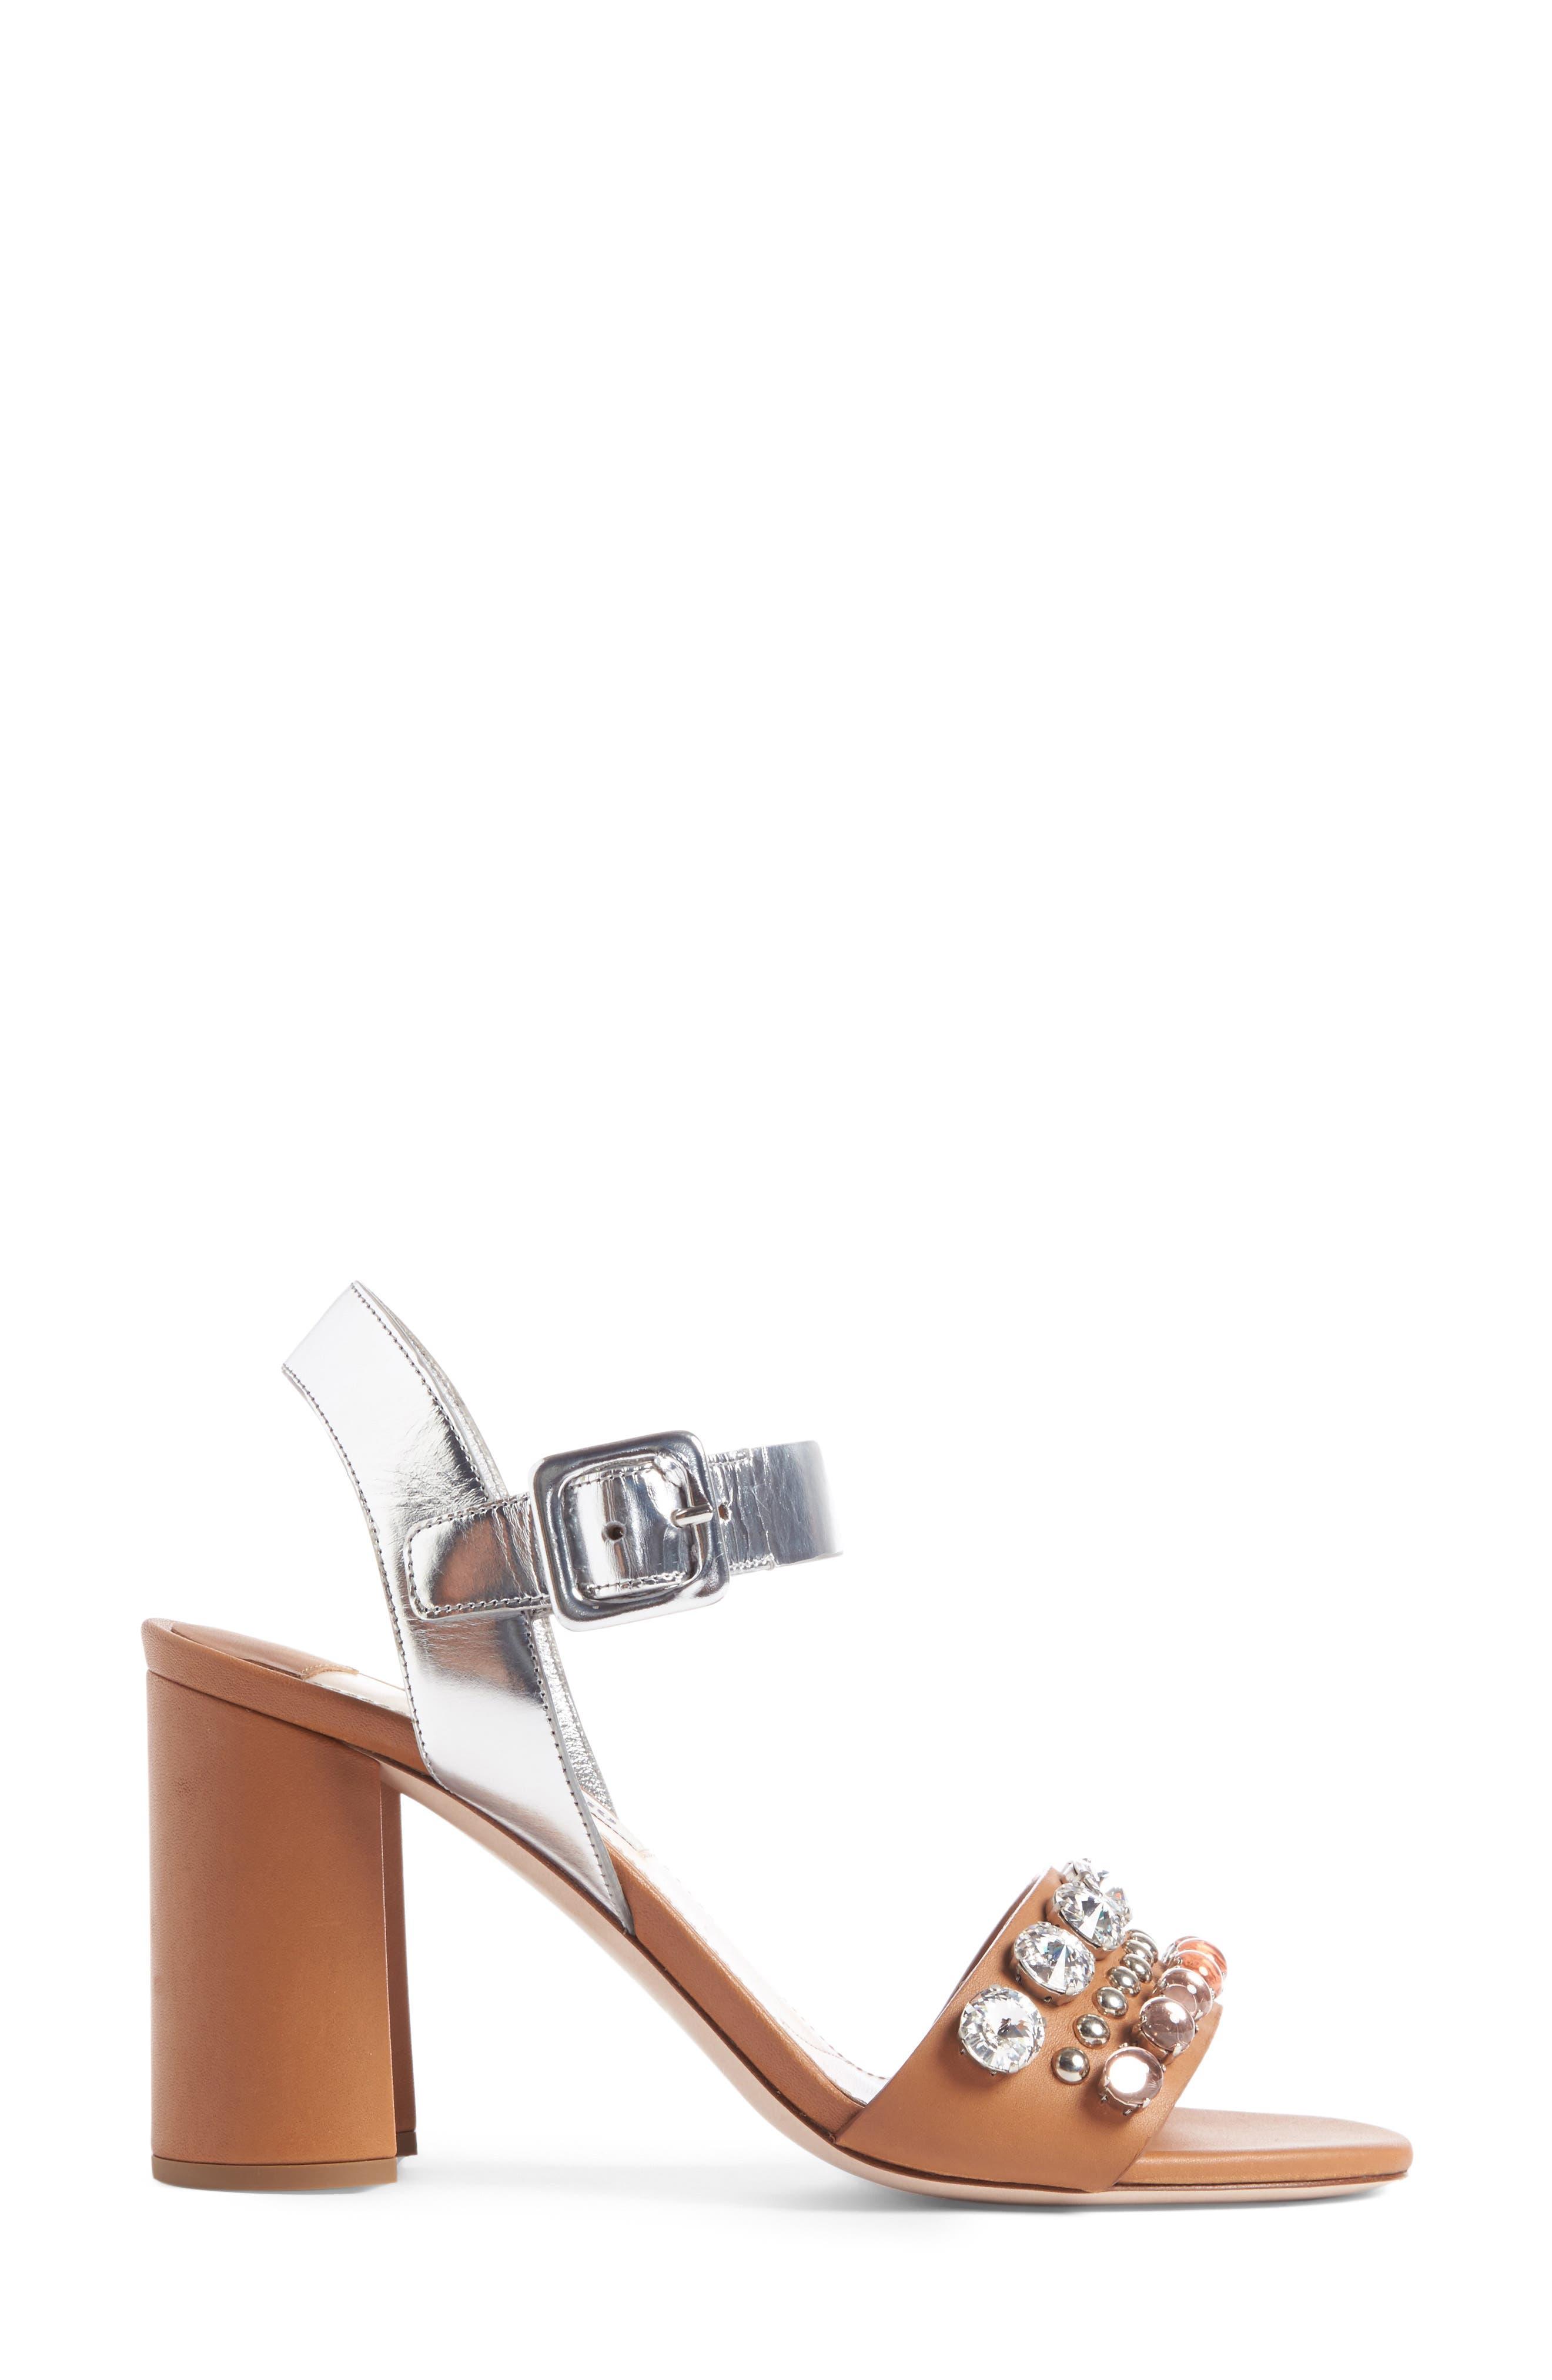 MIU MIU, Jewel Sandal, Alternate thumbnail 3, color, 200